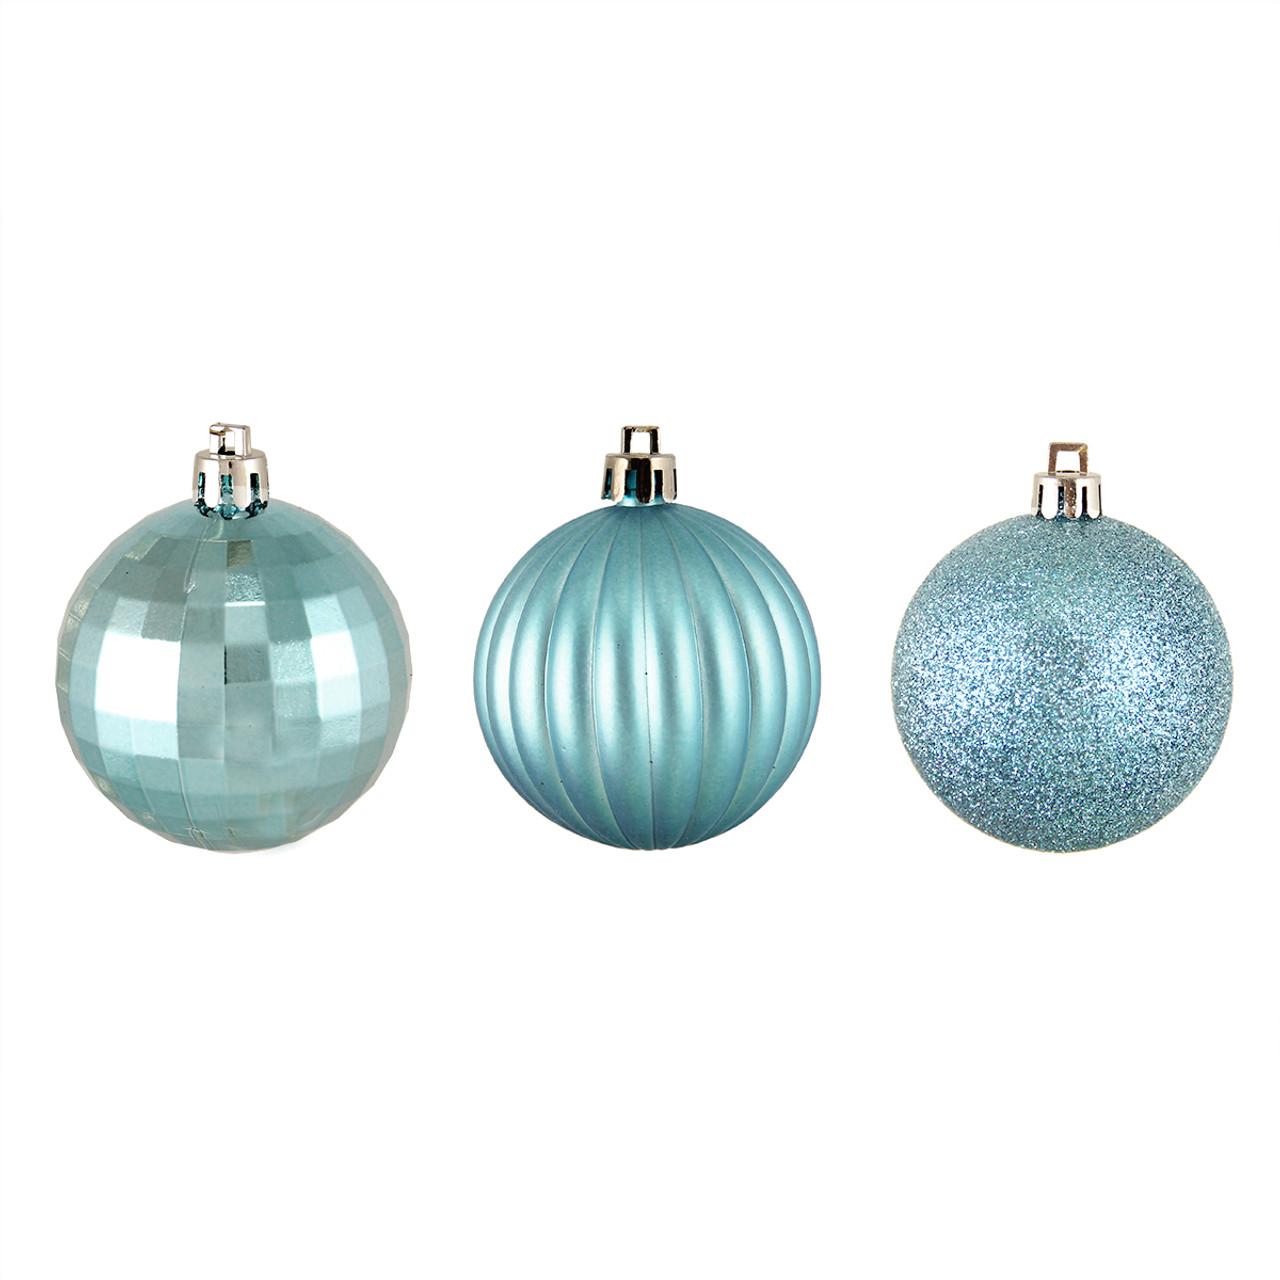 northlight - Christmas Balls Ornaments